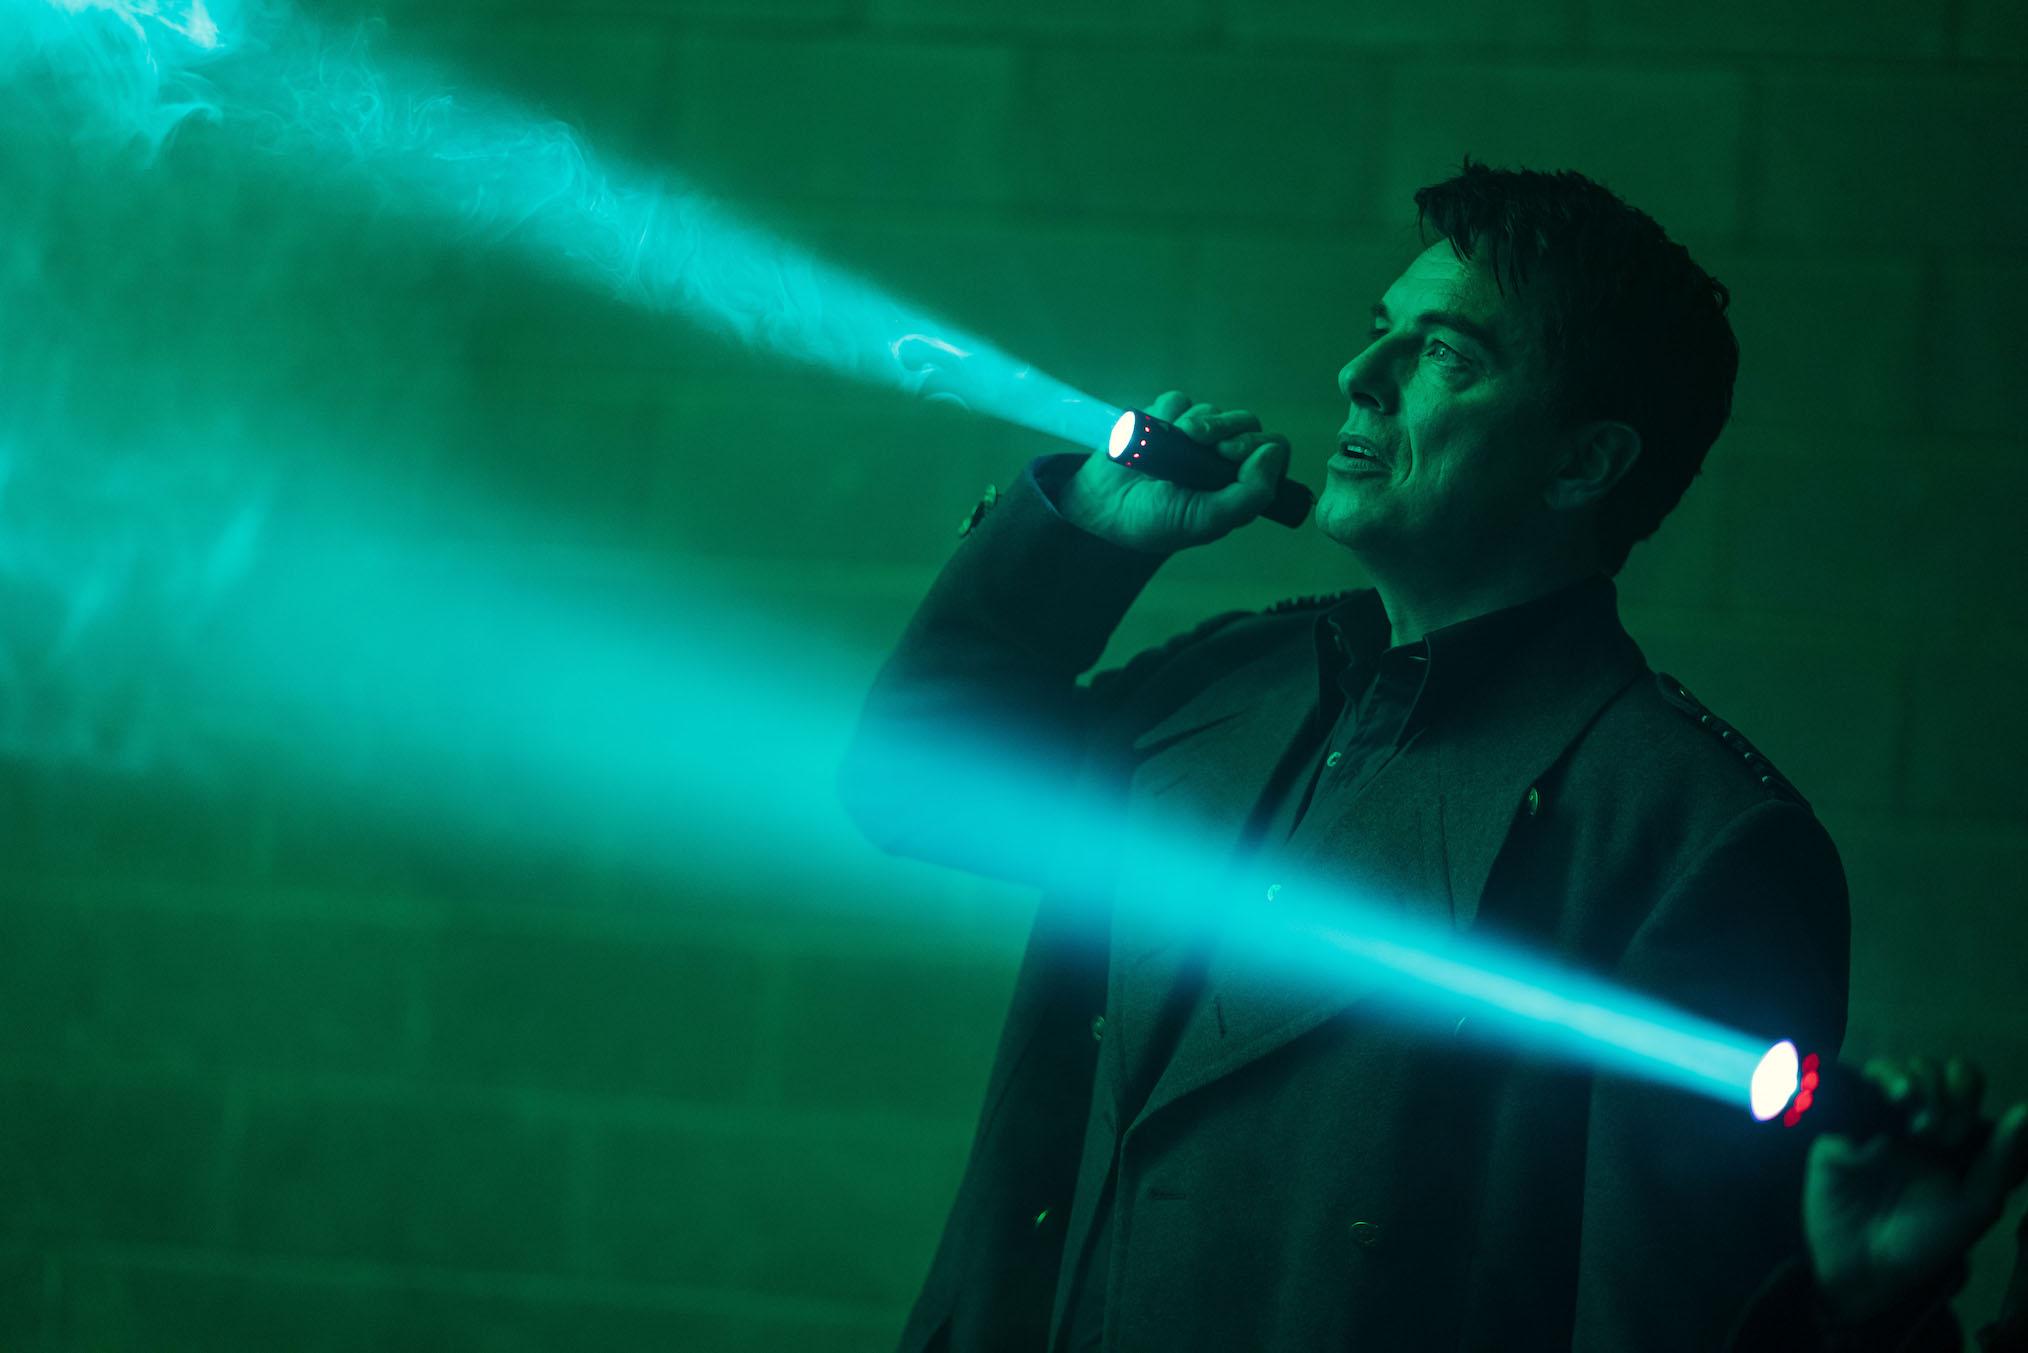 John Barrowman Doctor Who Révolution des Daleks Capitaine Jack Harkness